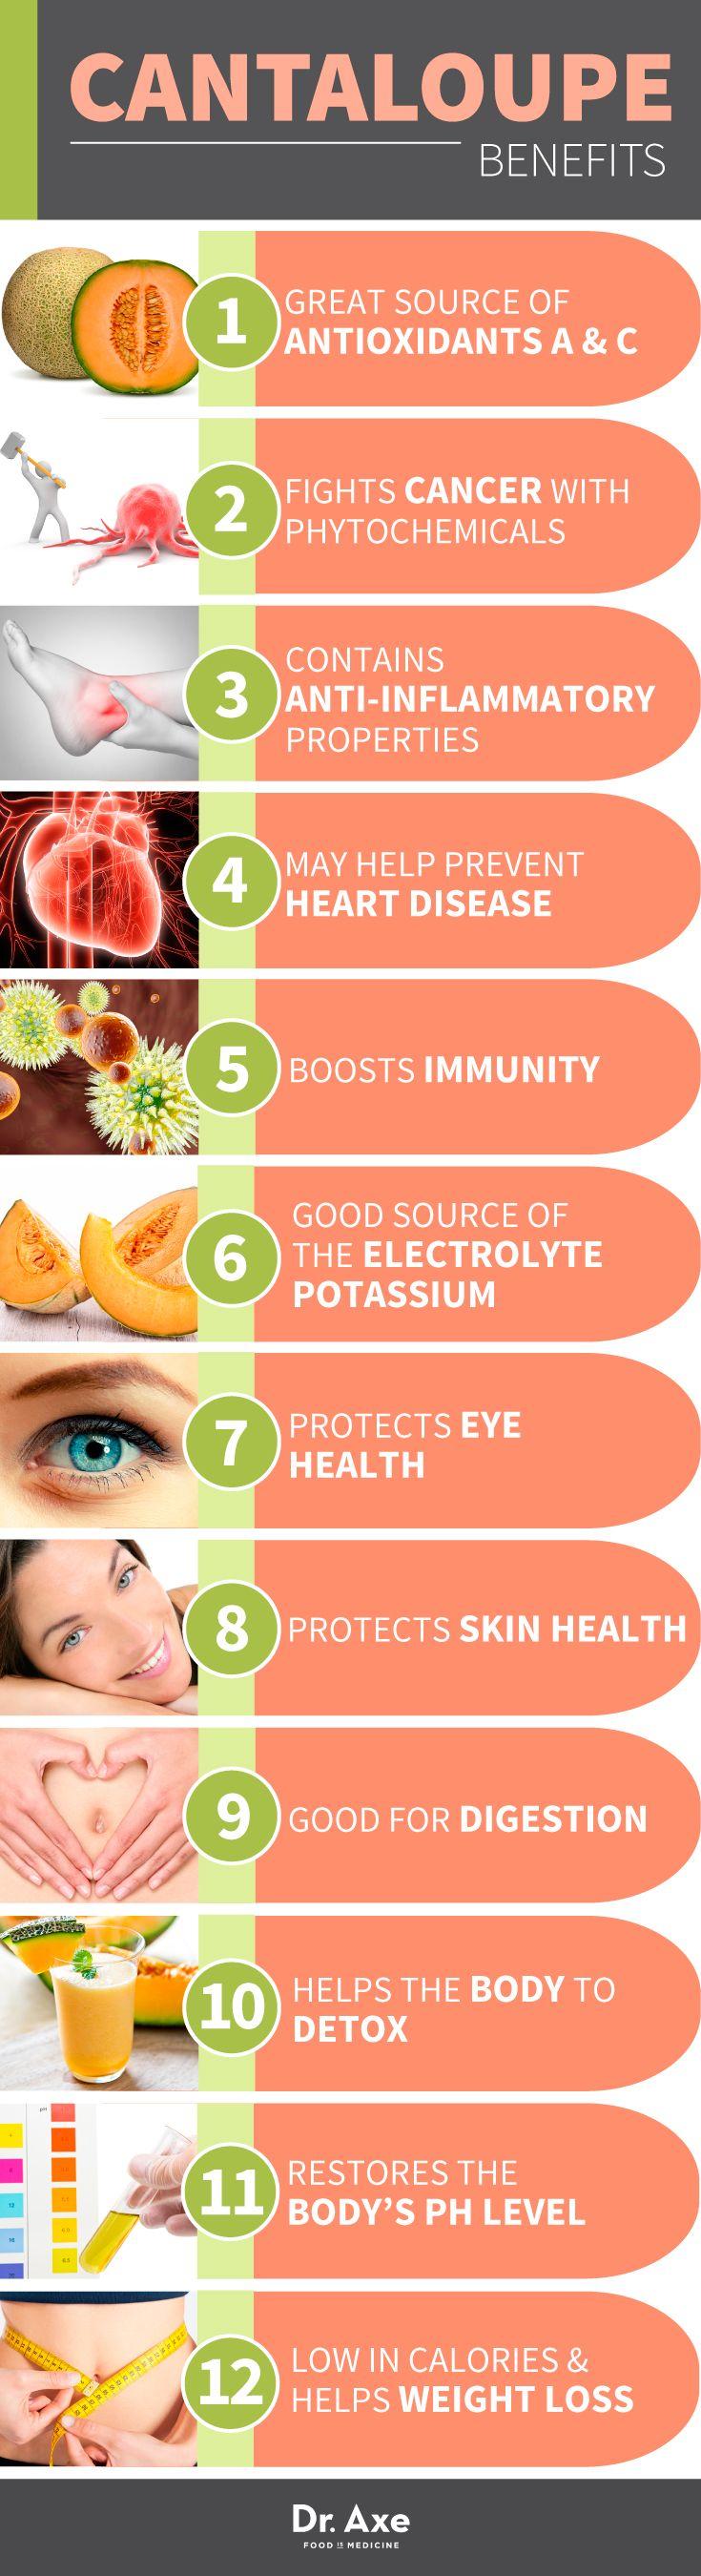 Cantaloupe Nutrition Benefits & How to Pick a Good Melon ...